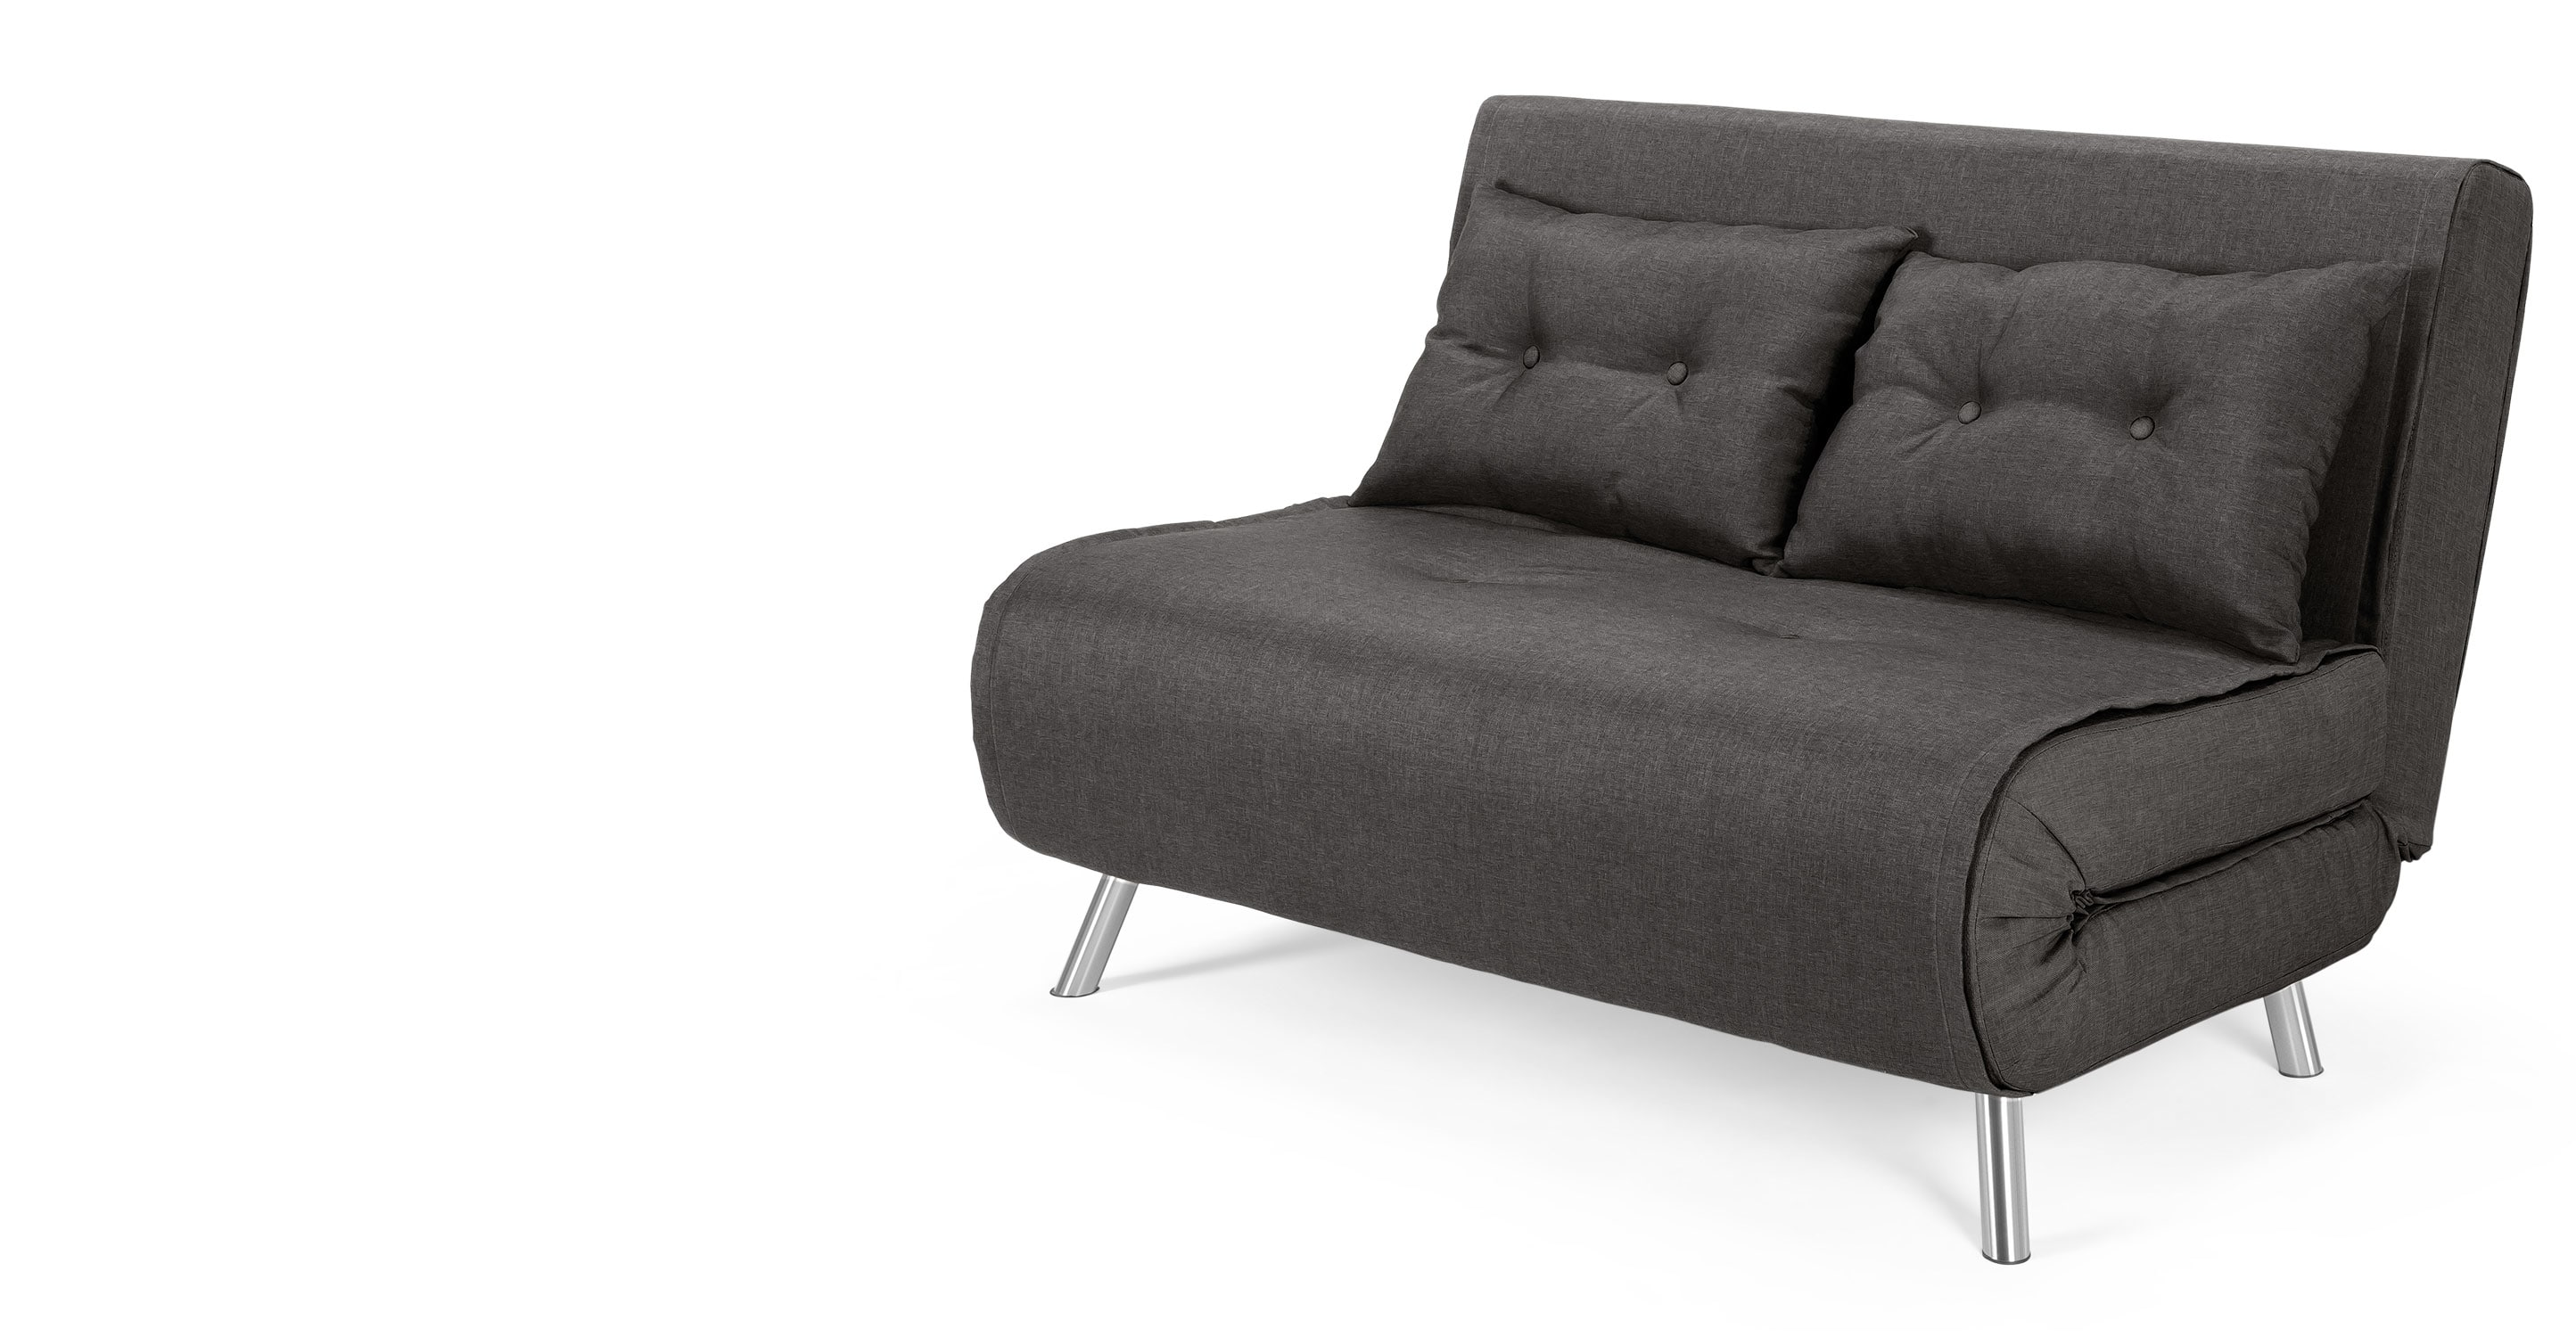 small sofa bed haru small sofabed, cygnet grey   made.com HJMTYFM